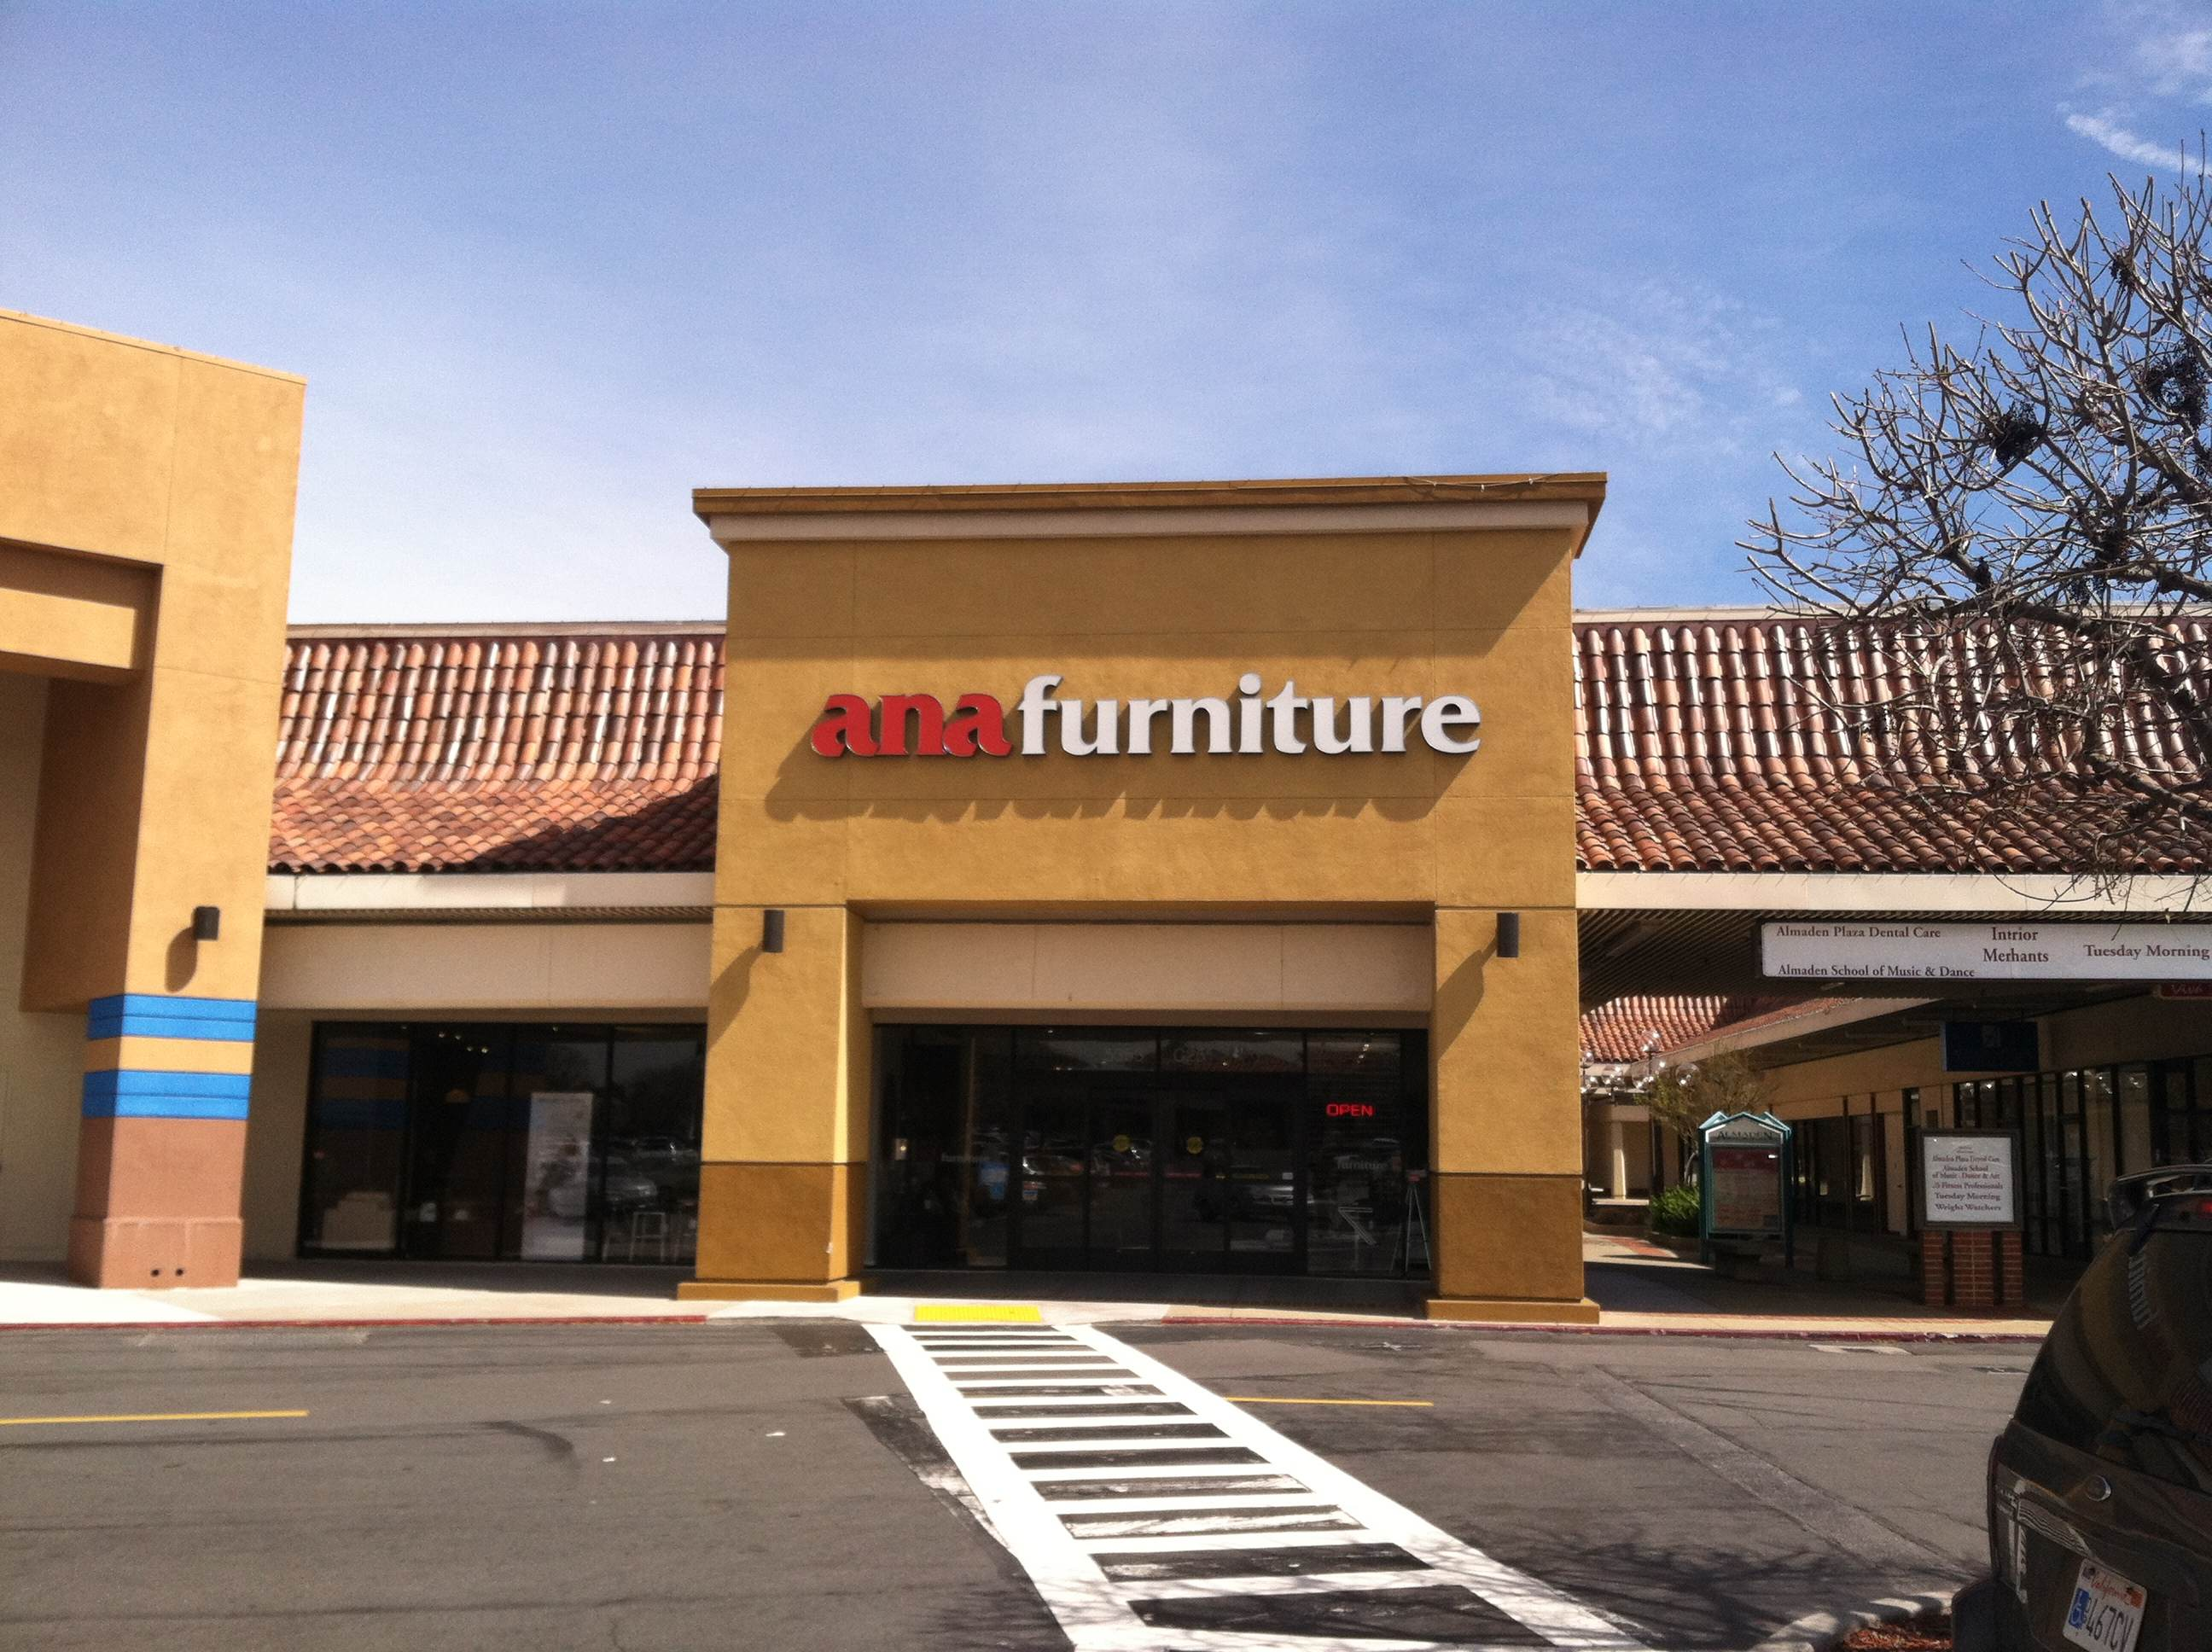 Ana furniture store location in san jose. furniture showroom in almaden, san jose California